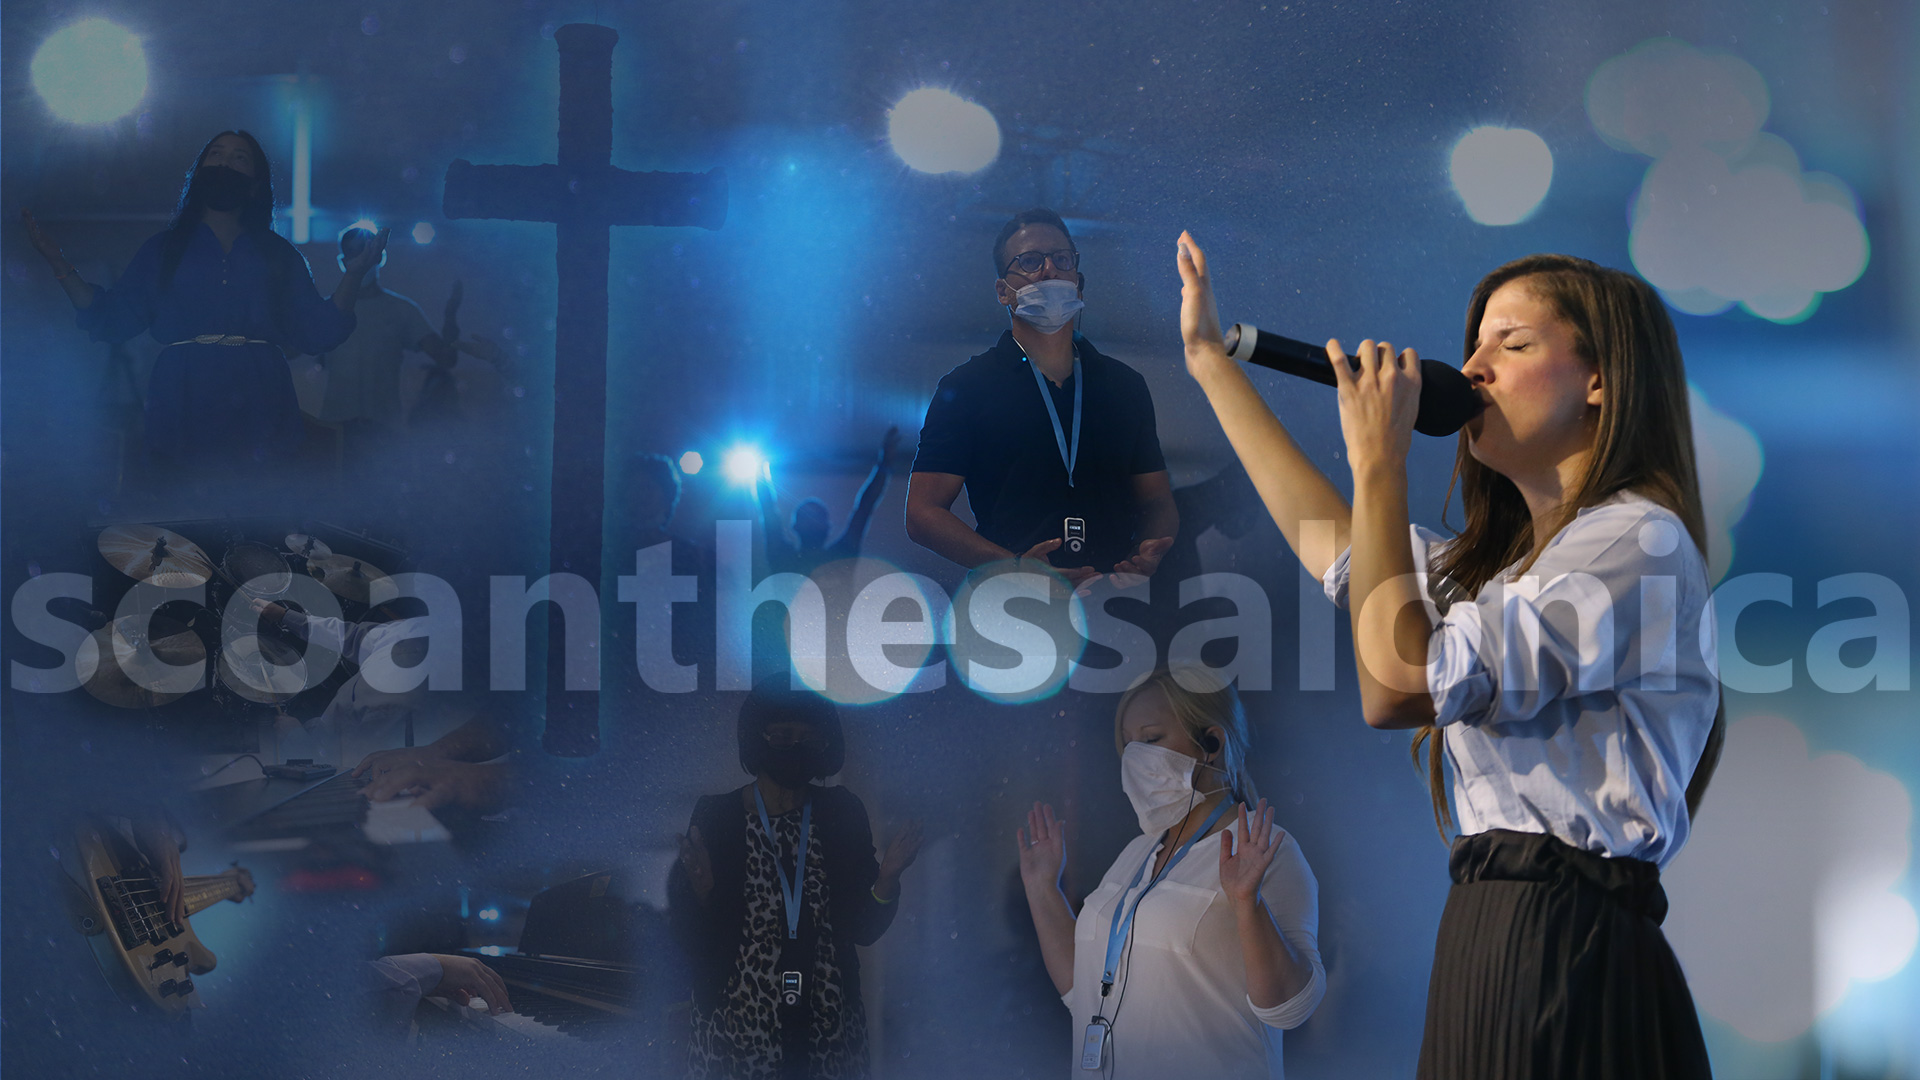 SCOAN_THESSALONICA_WORSHIP_2020_08_30